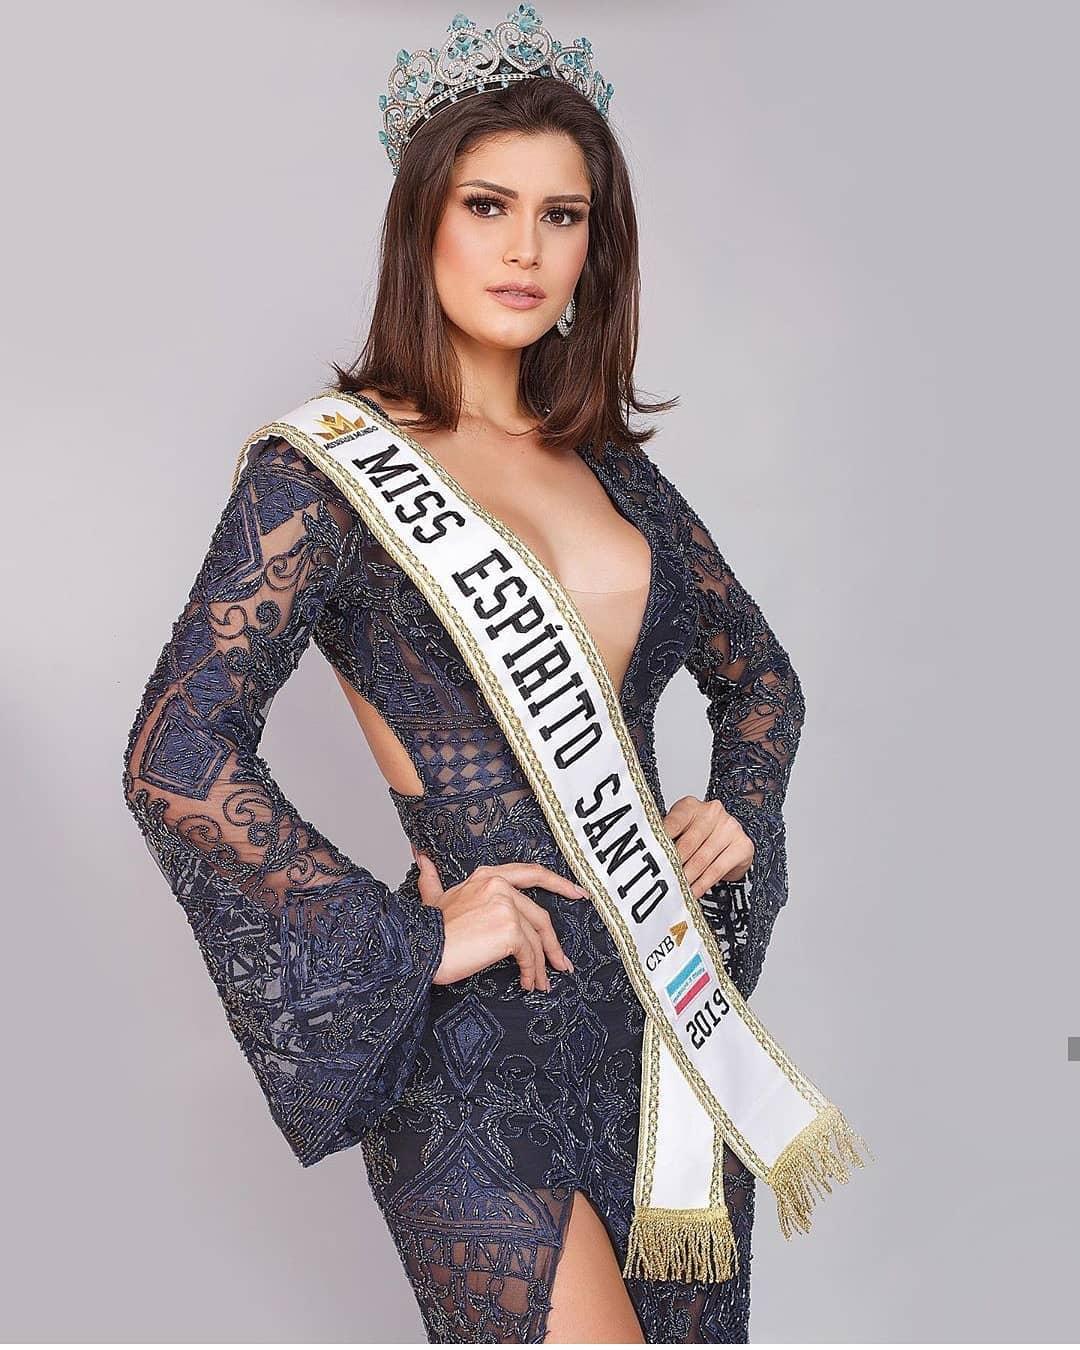 elis miele, top 5 de miss world 2019. - Página 4 67843210